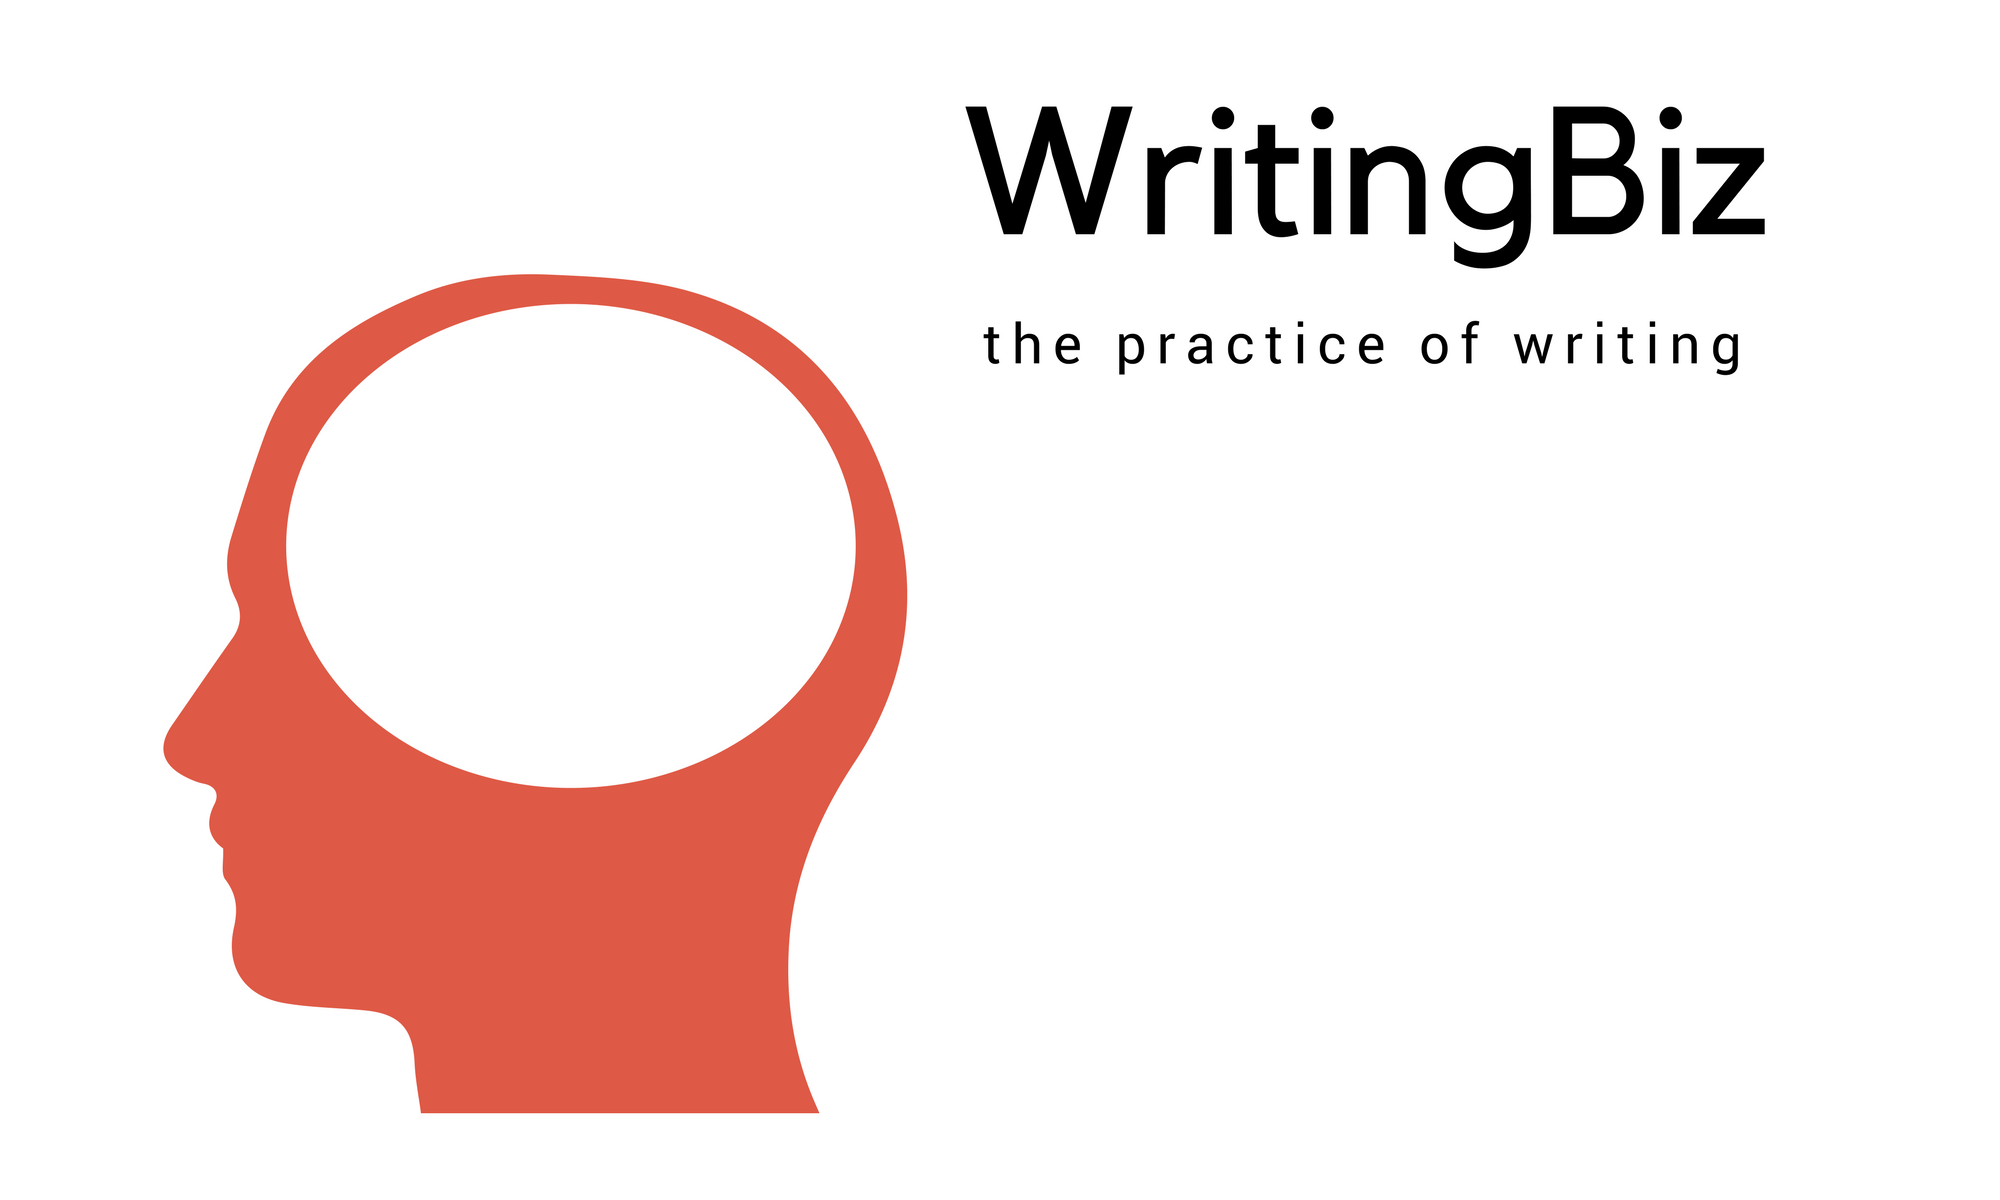 WritingBiz - Make money writing - the craft of writing